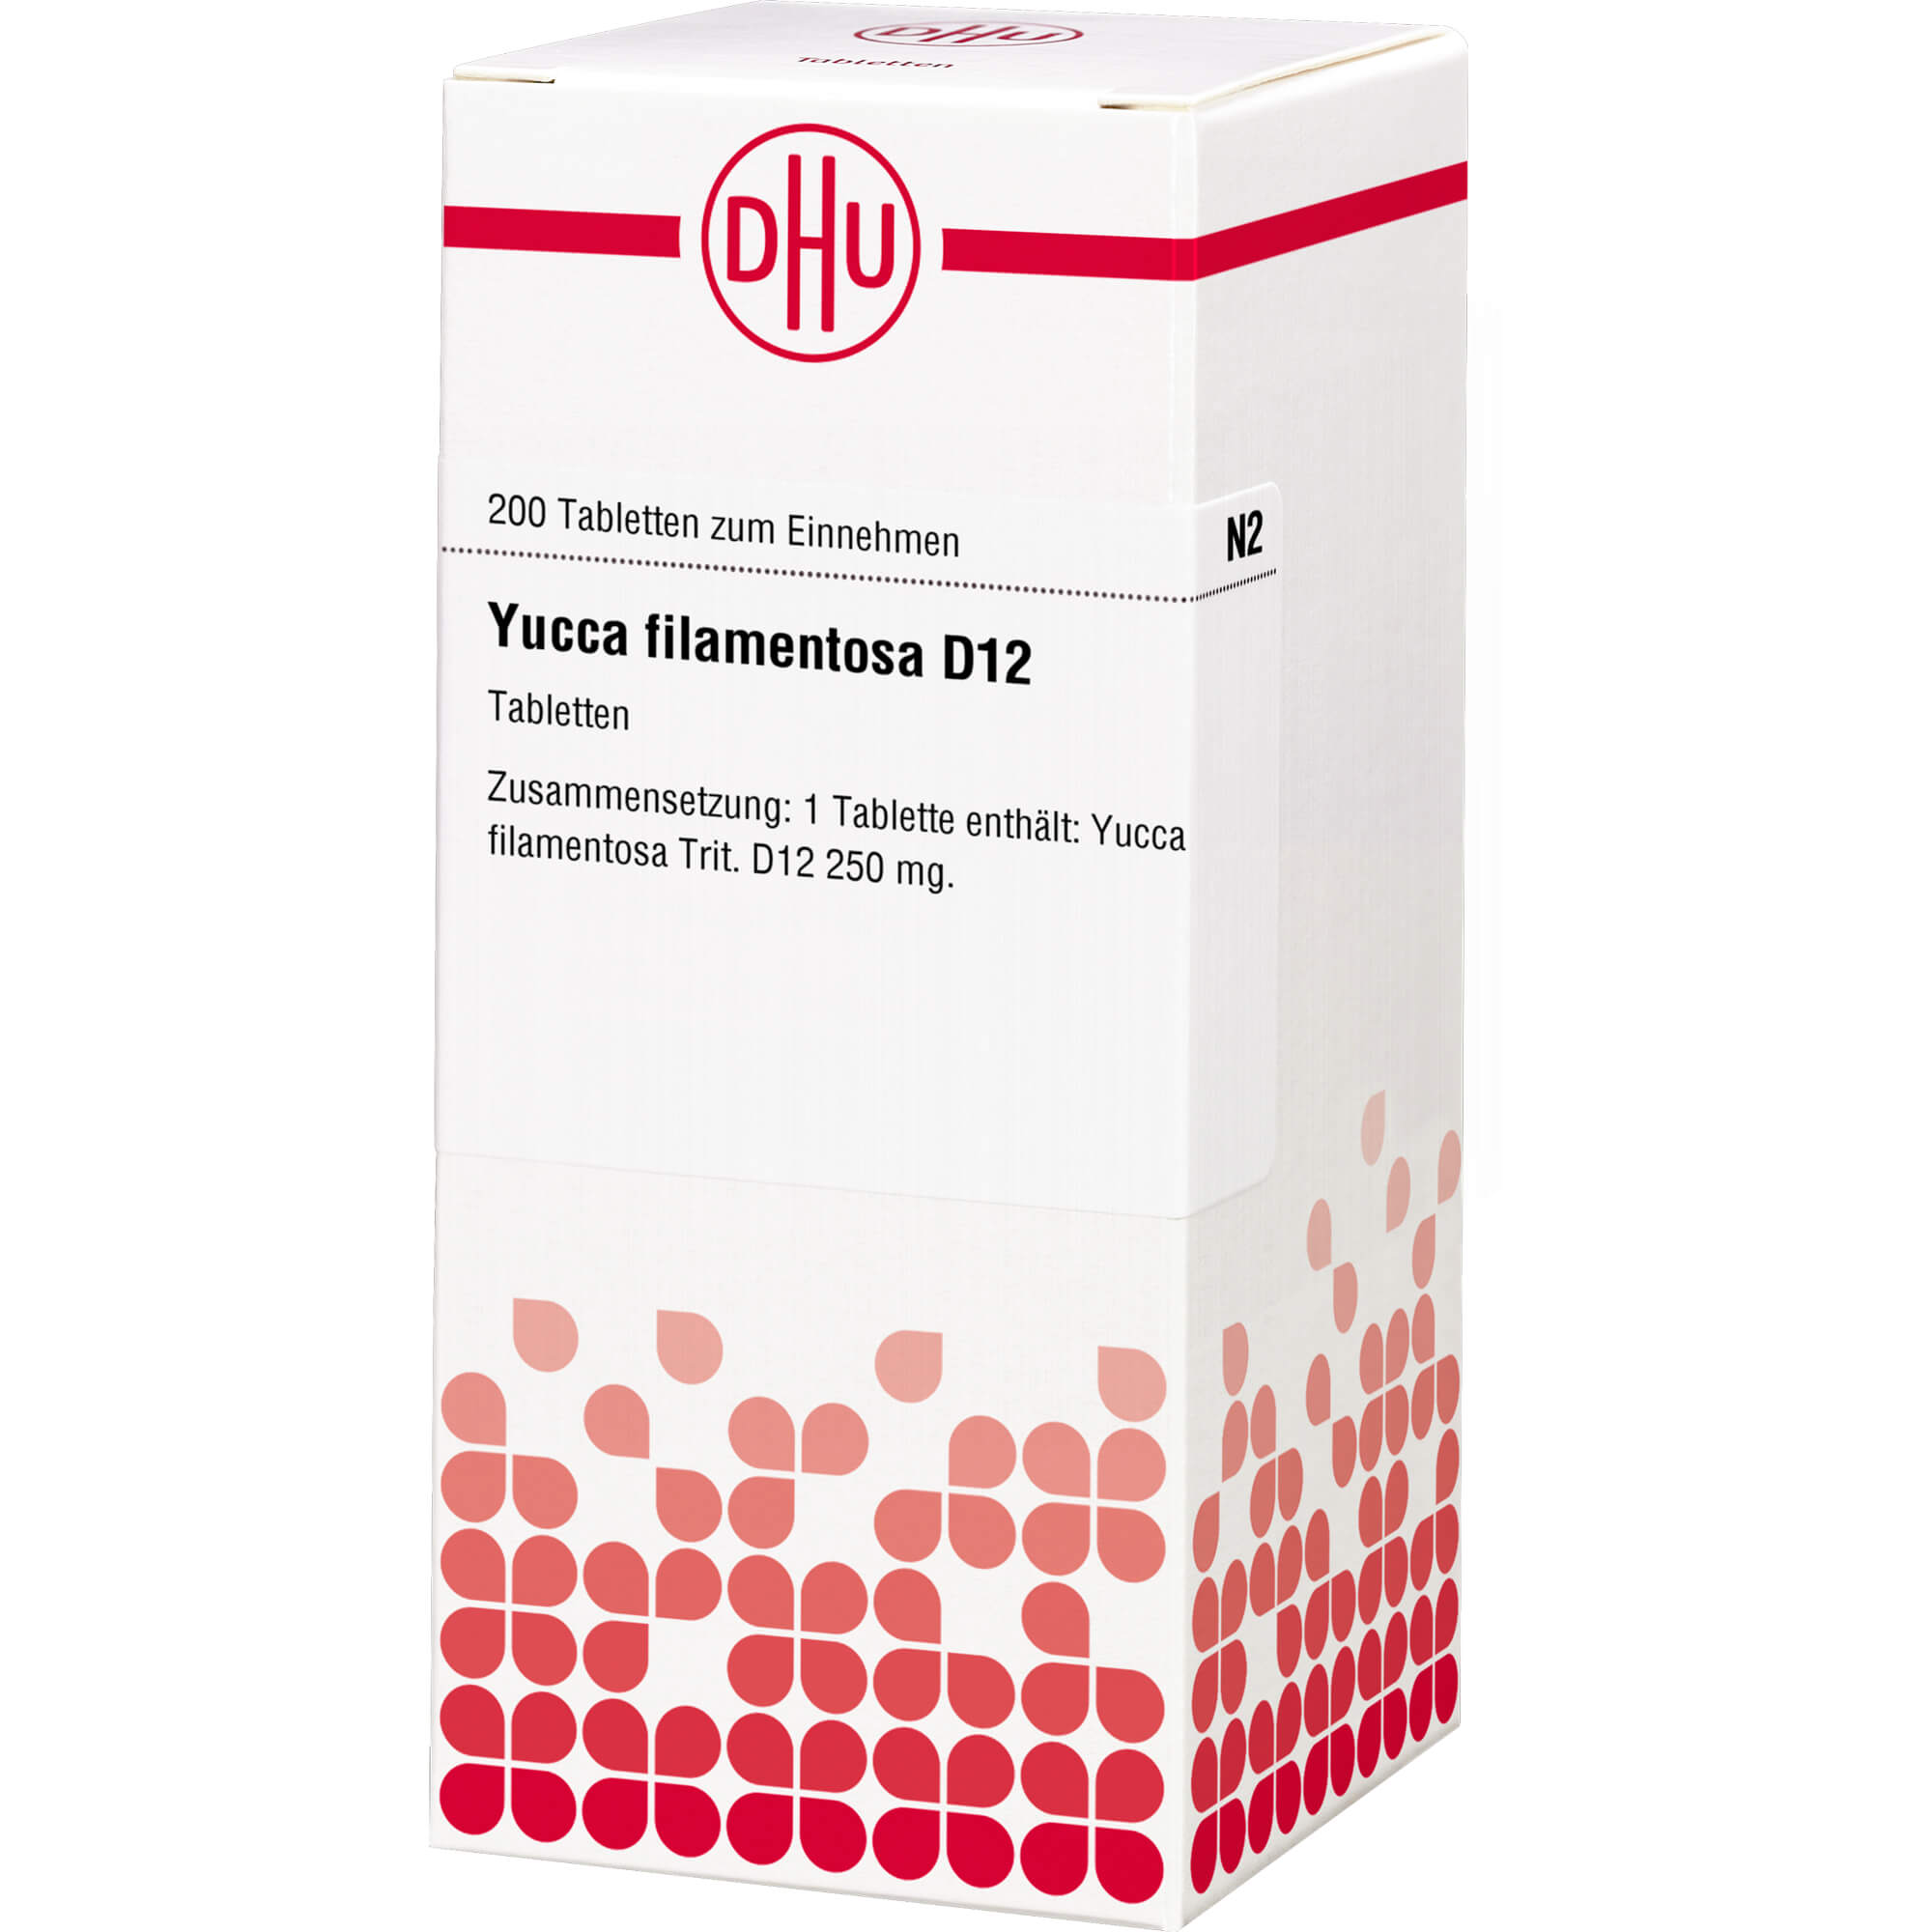 YUCCA FILAMENTOSA D 12 Tabletten